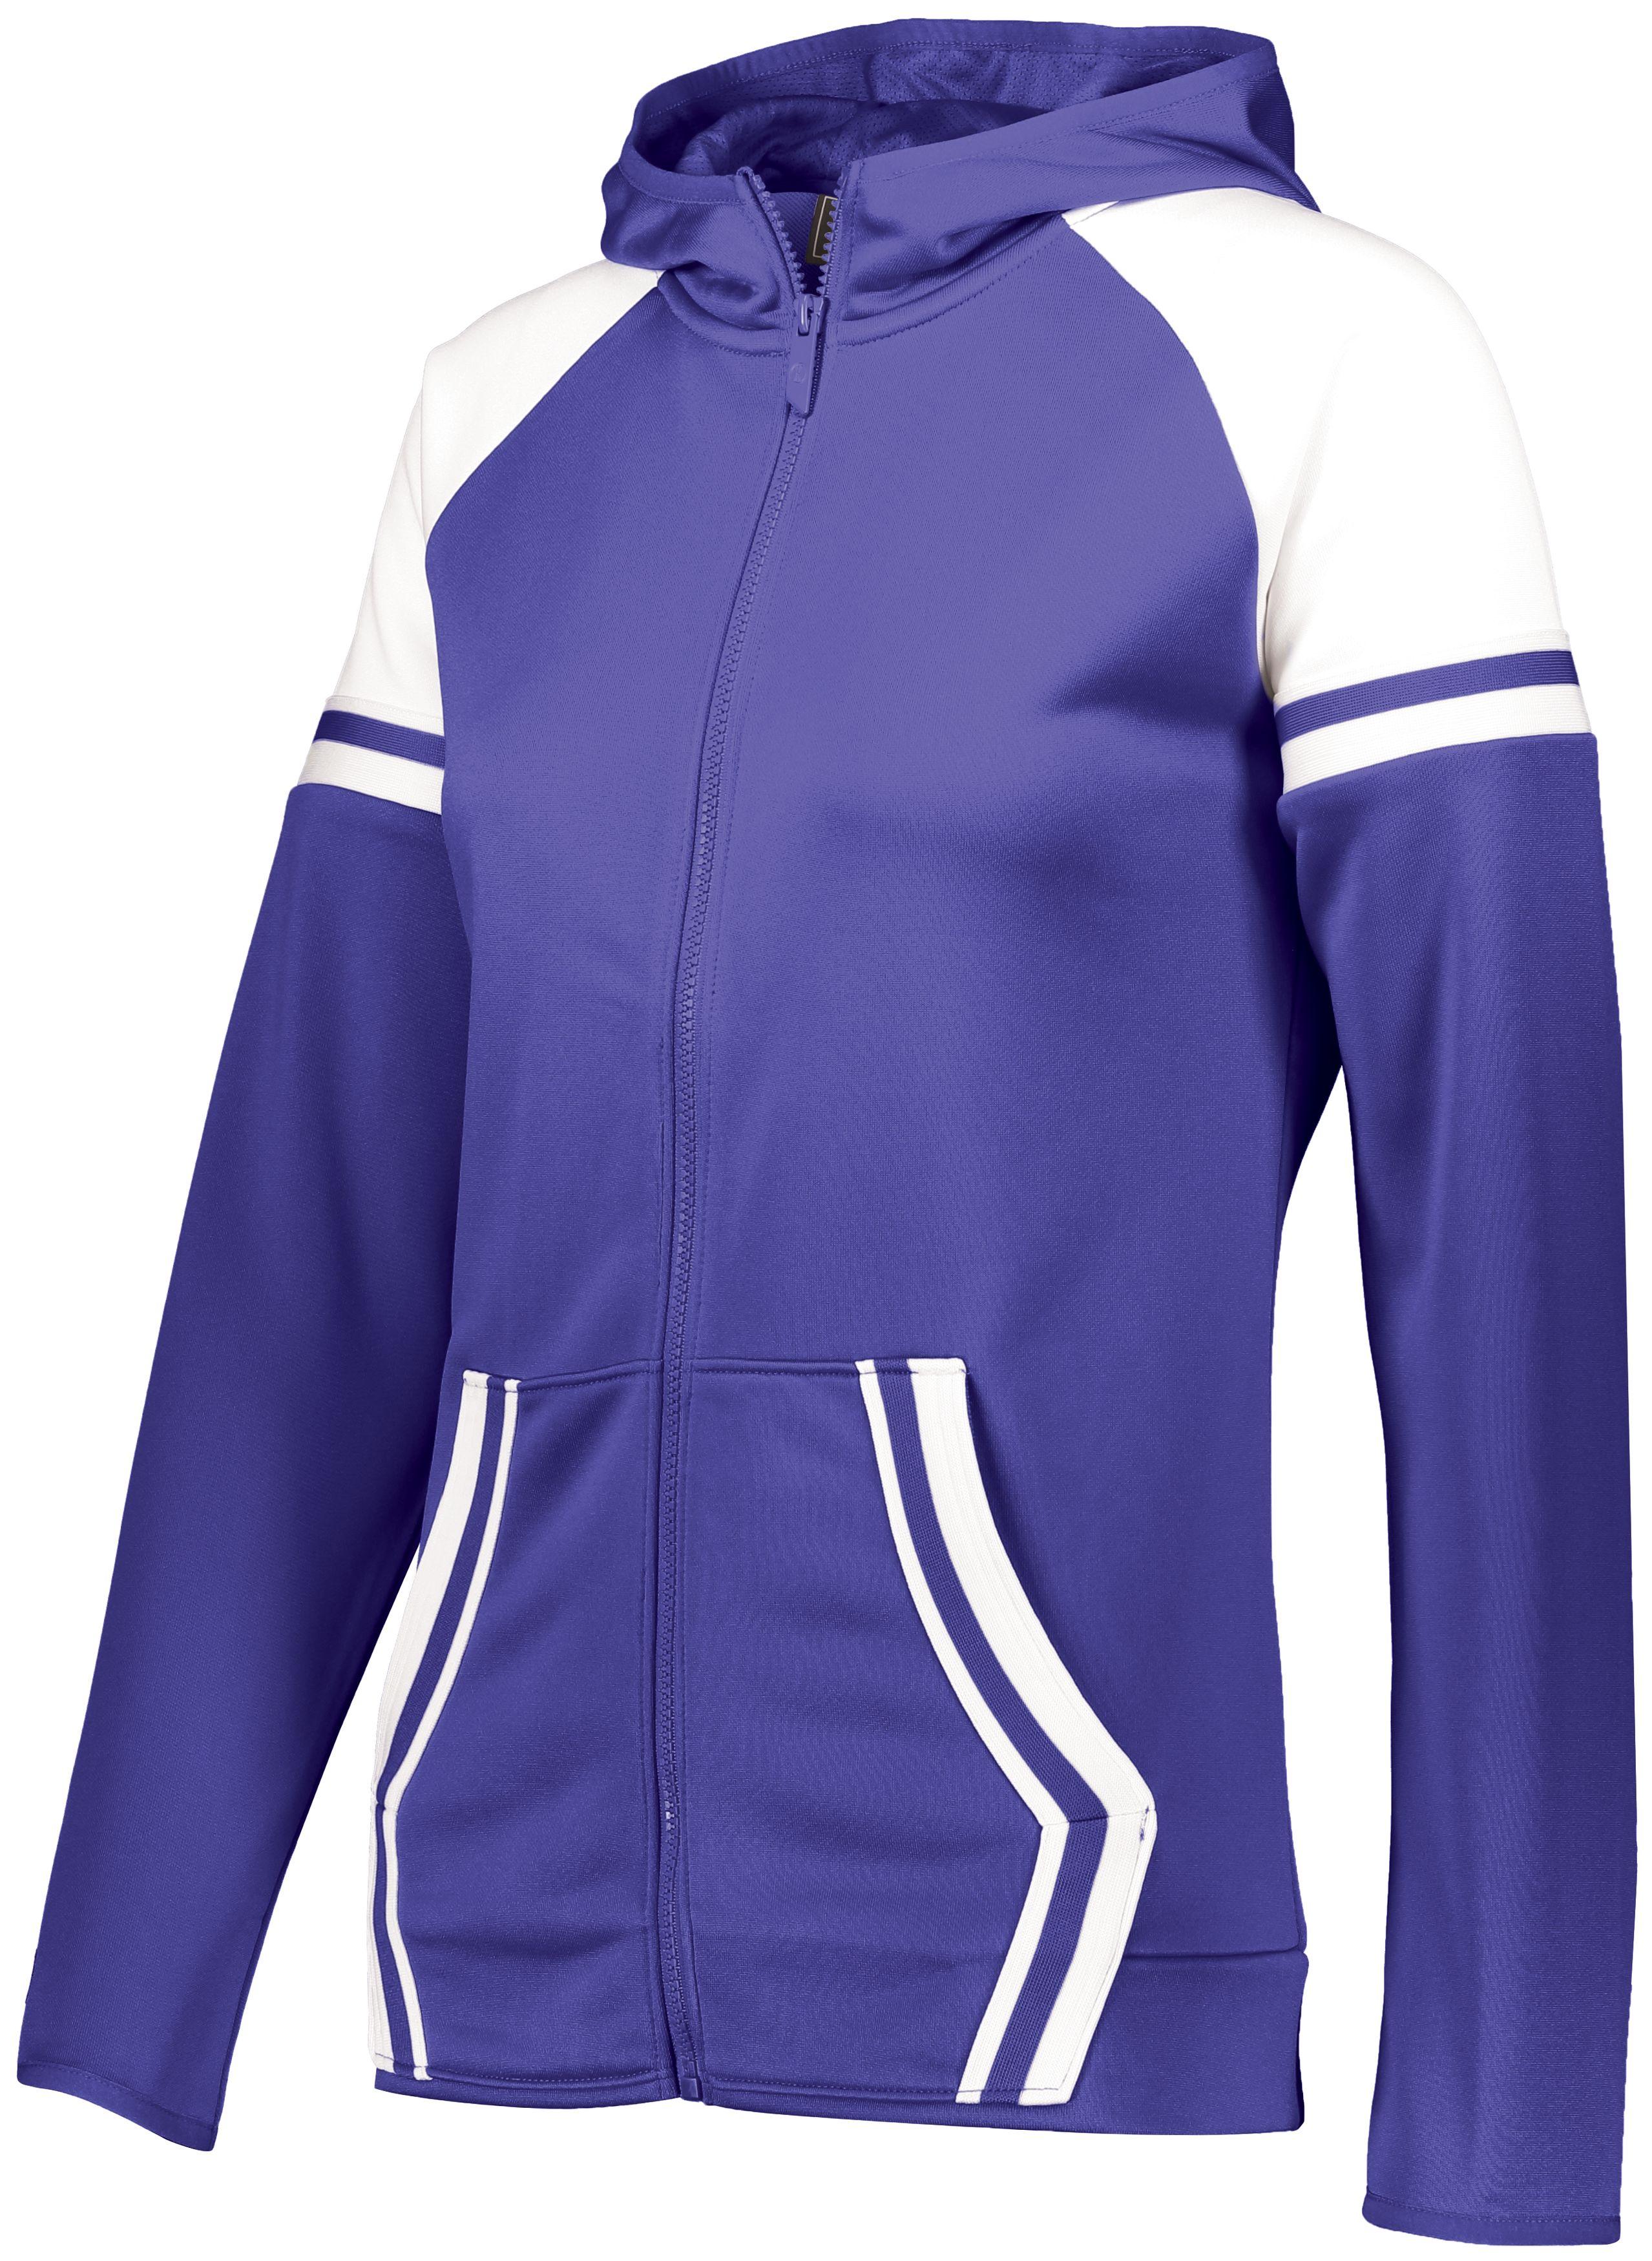 Ladies Retro Grade Jacket - Purple/white